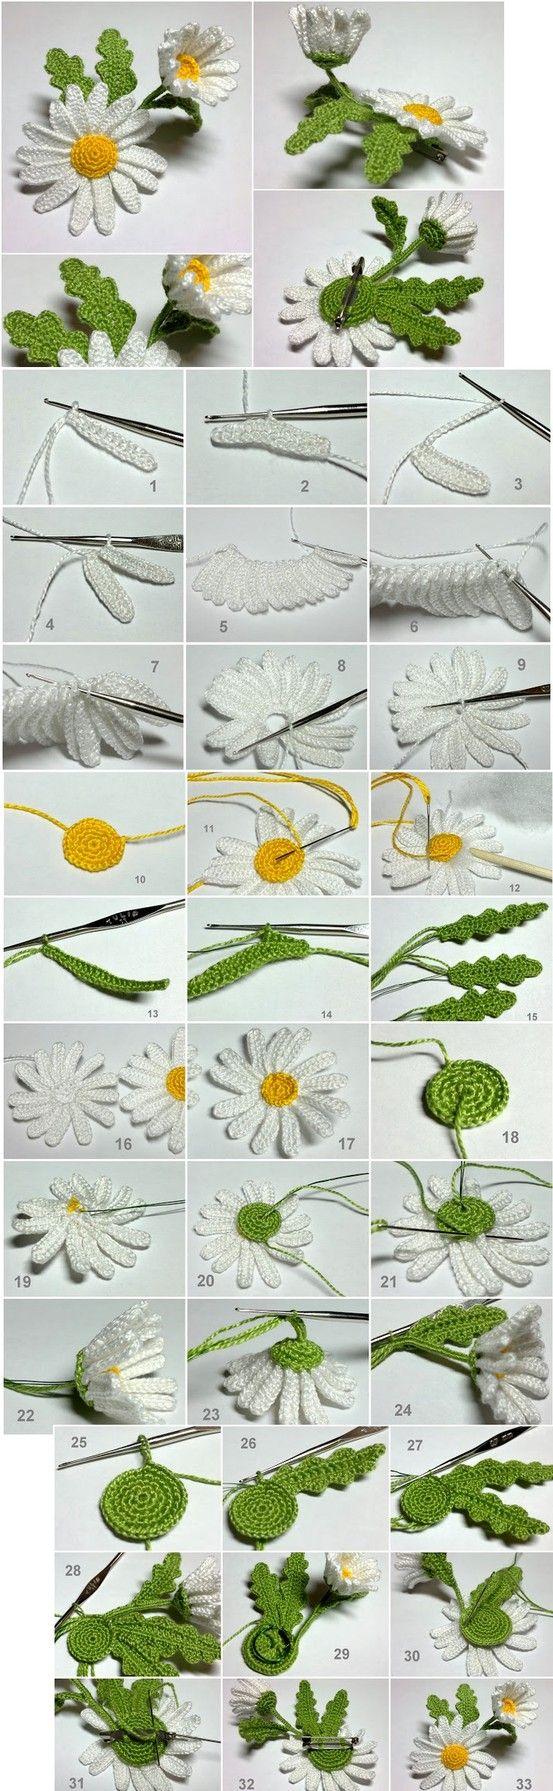 crochet daisy brooch - complete pictorial!